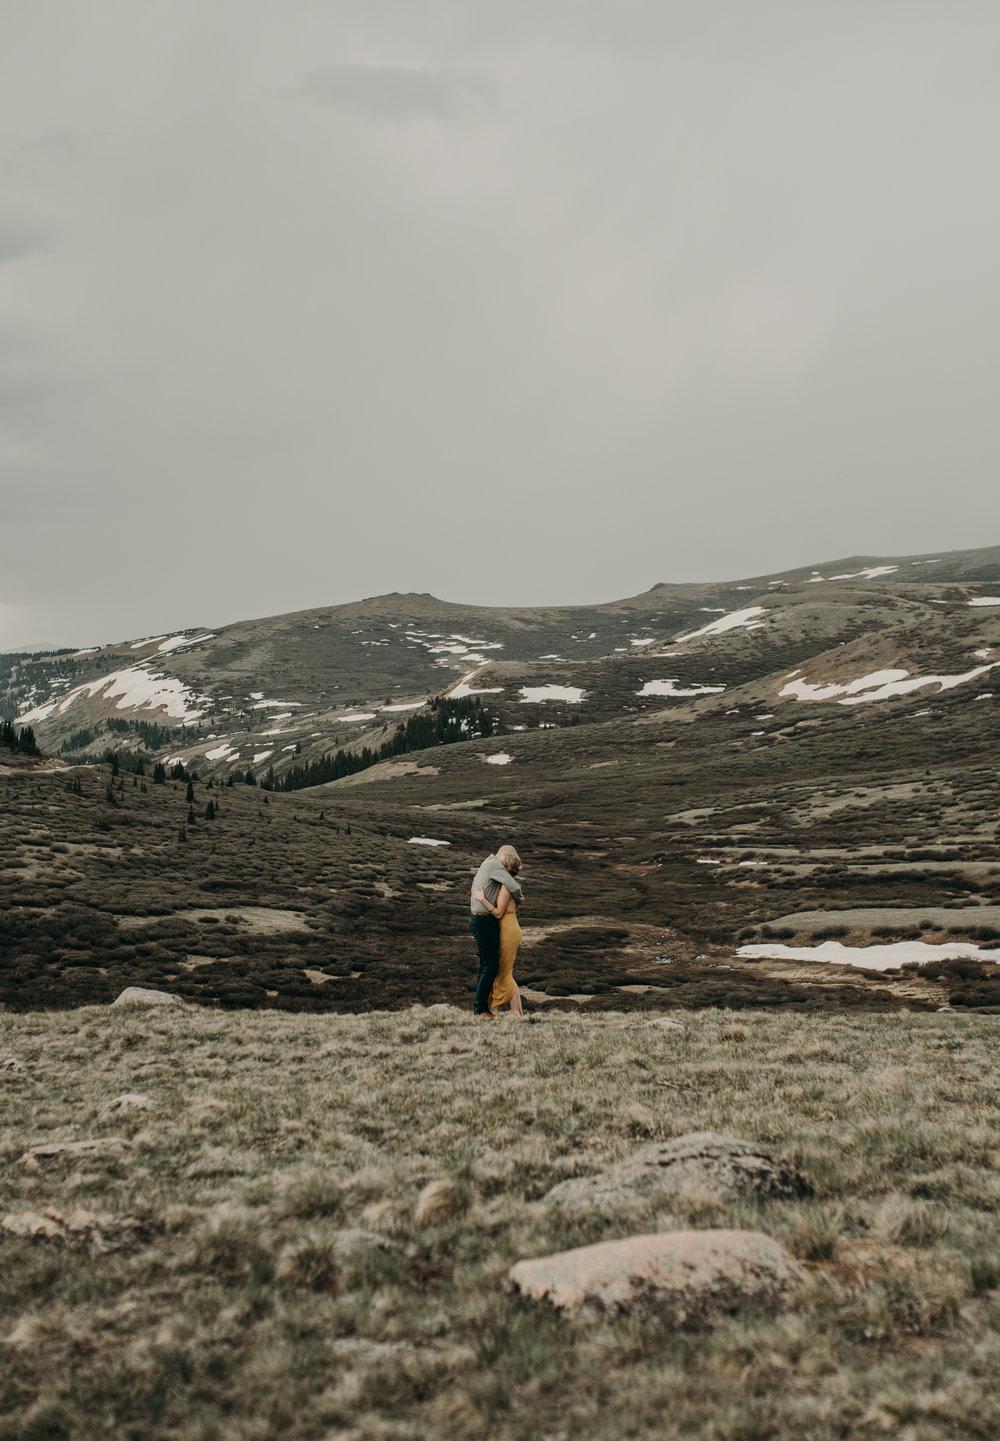 Colorado based adventure elopement photographer